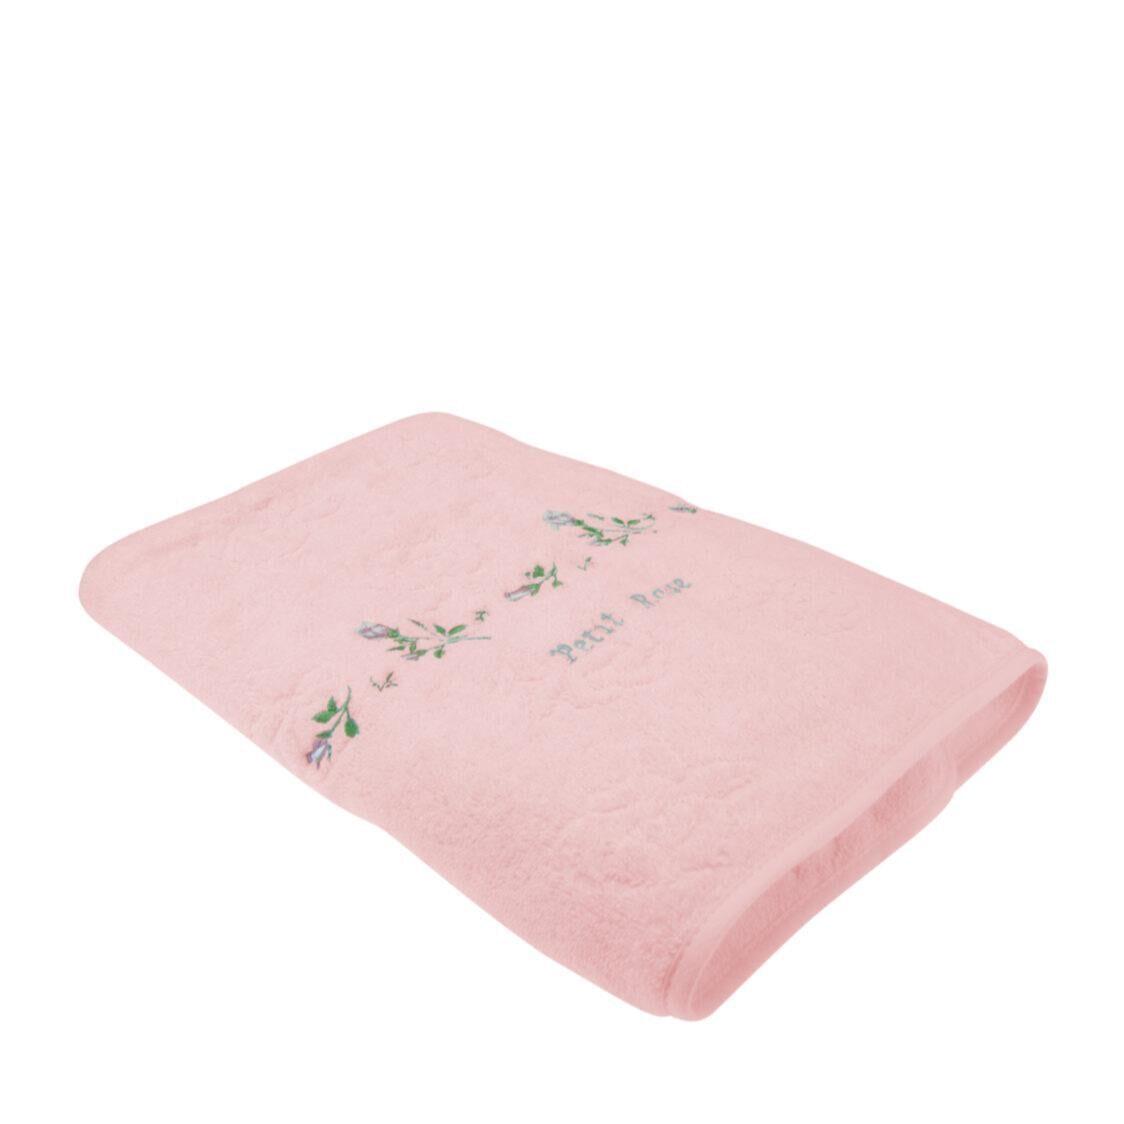 Petit Rose 100 Combed Cotton Bath Towel Pink